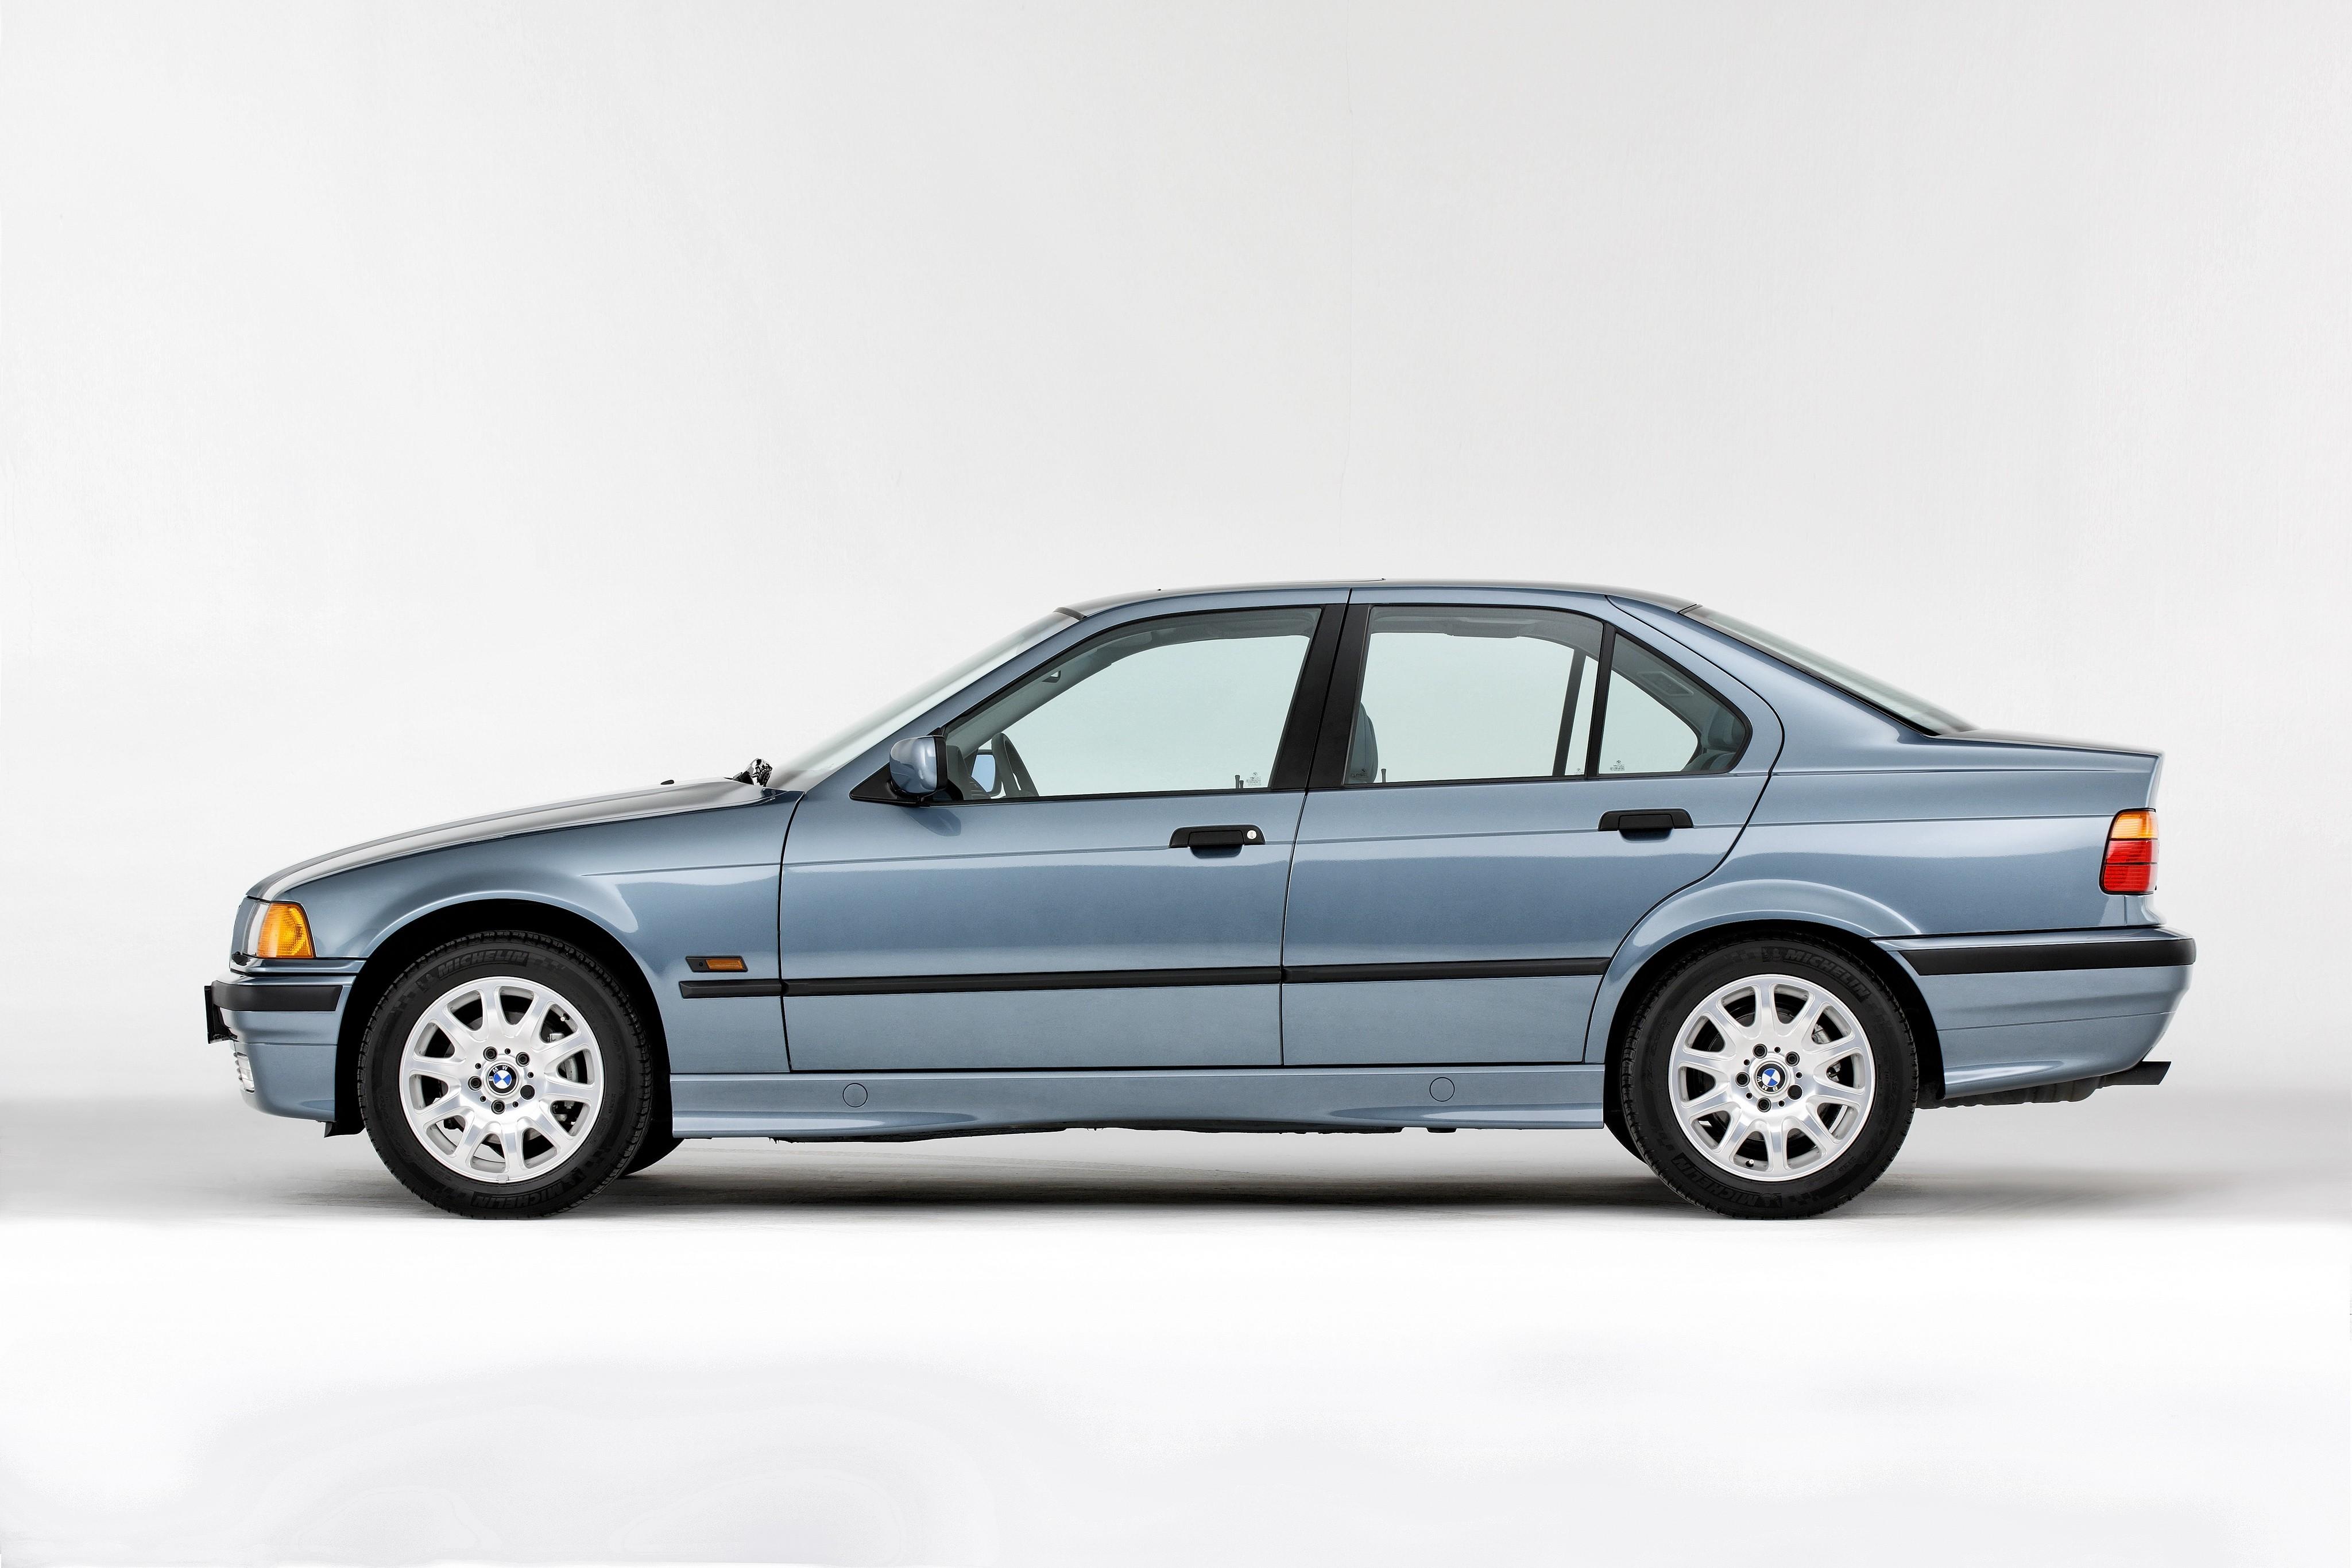 Bmw 3 Series Sedan E36 Specs 1991 1992 1993 1994